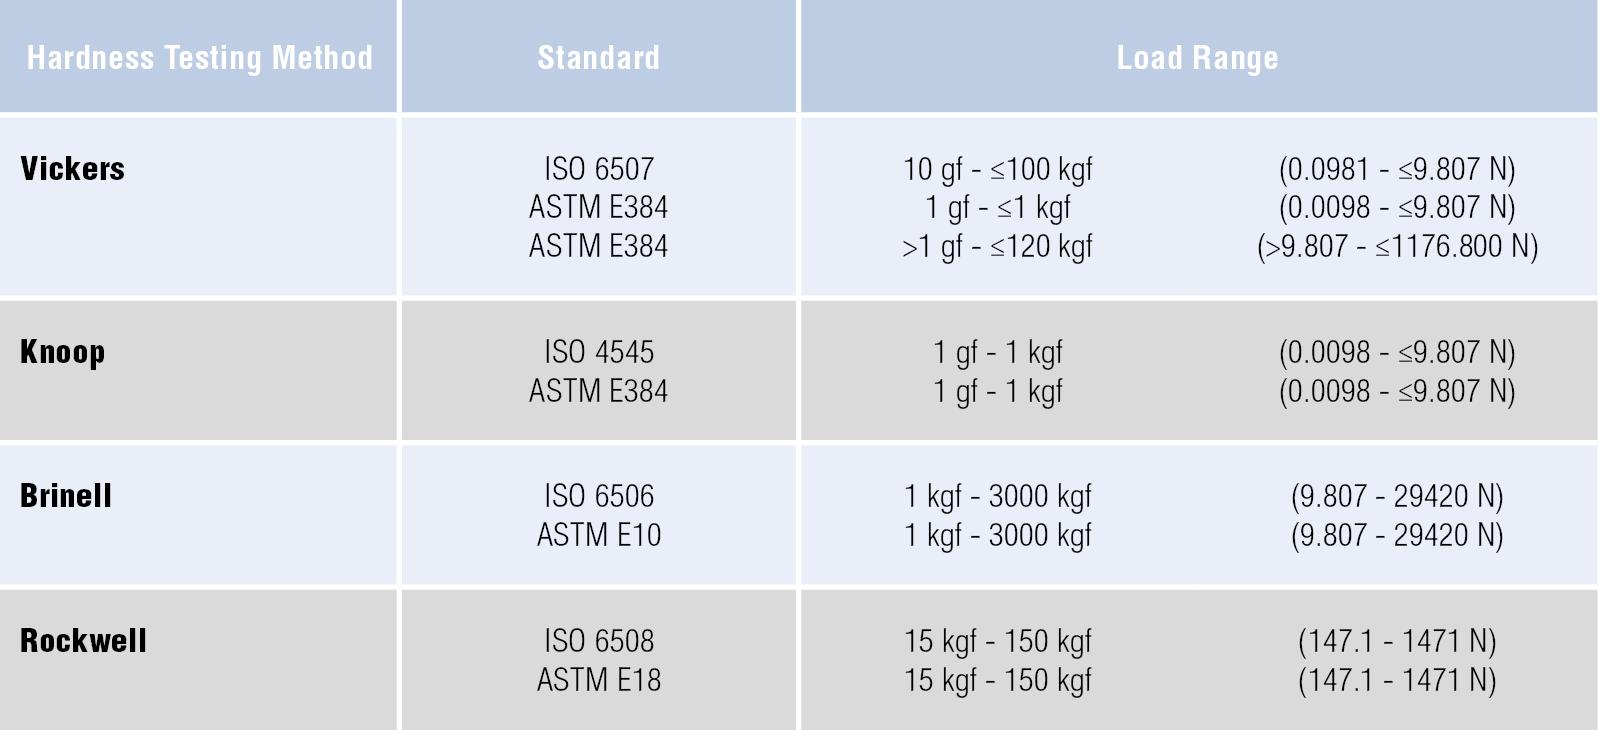 Hardness Testing Method Table 2